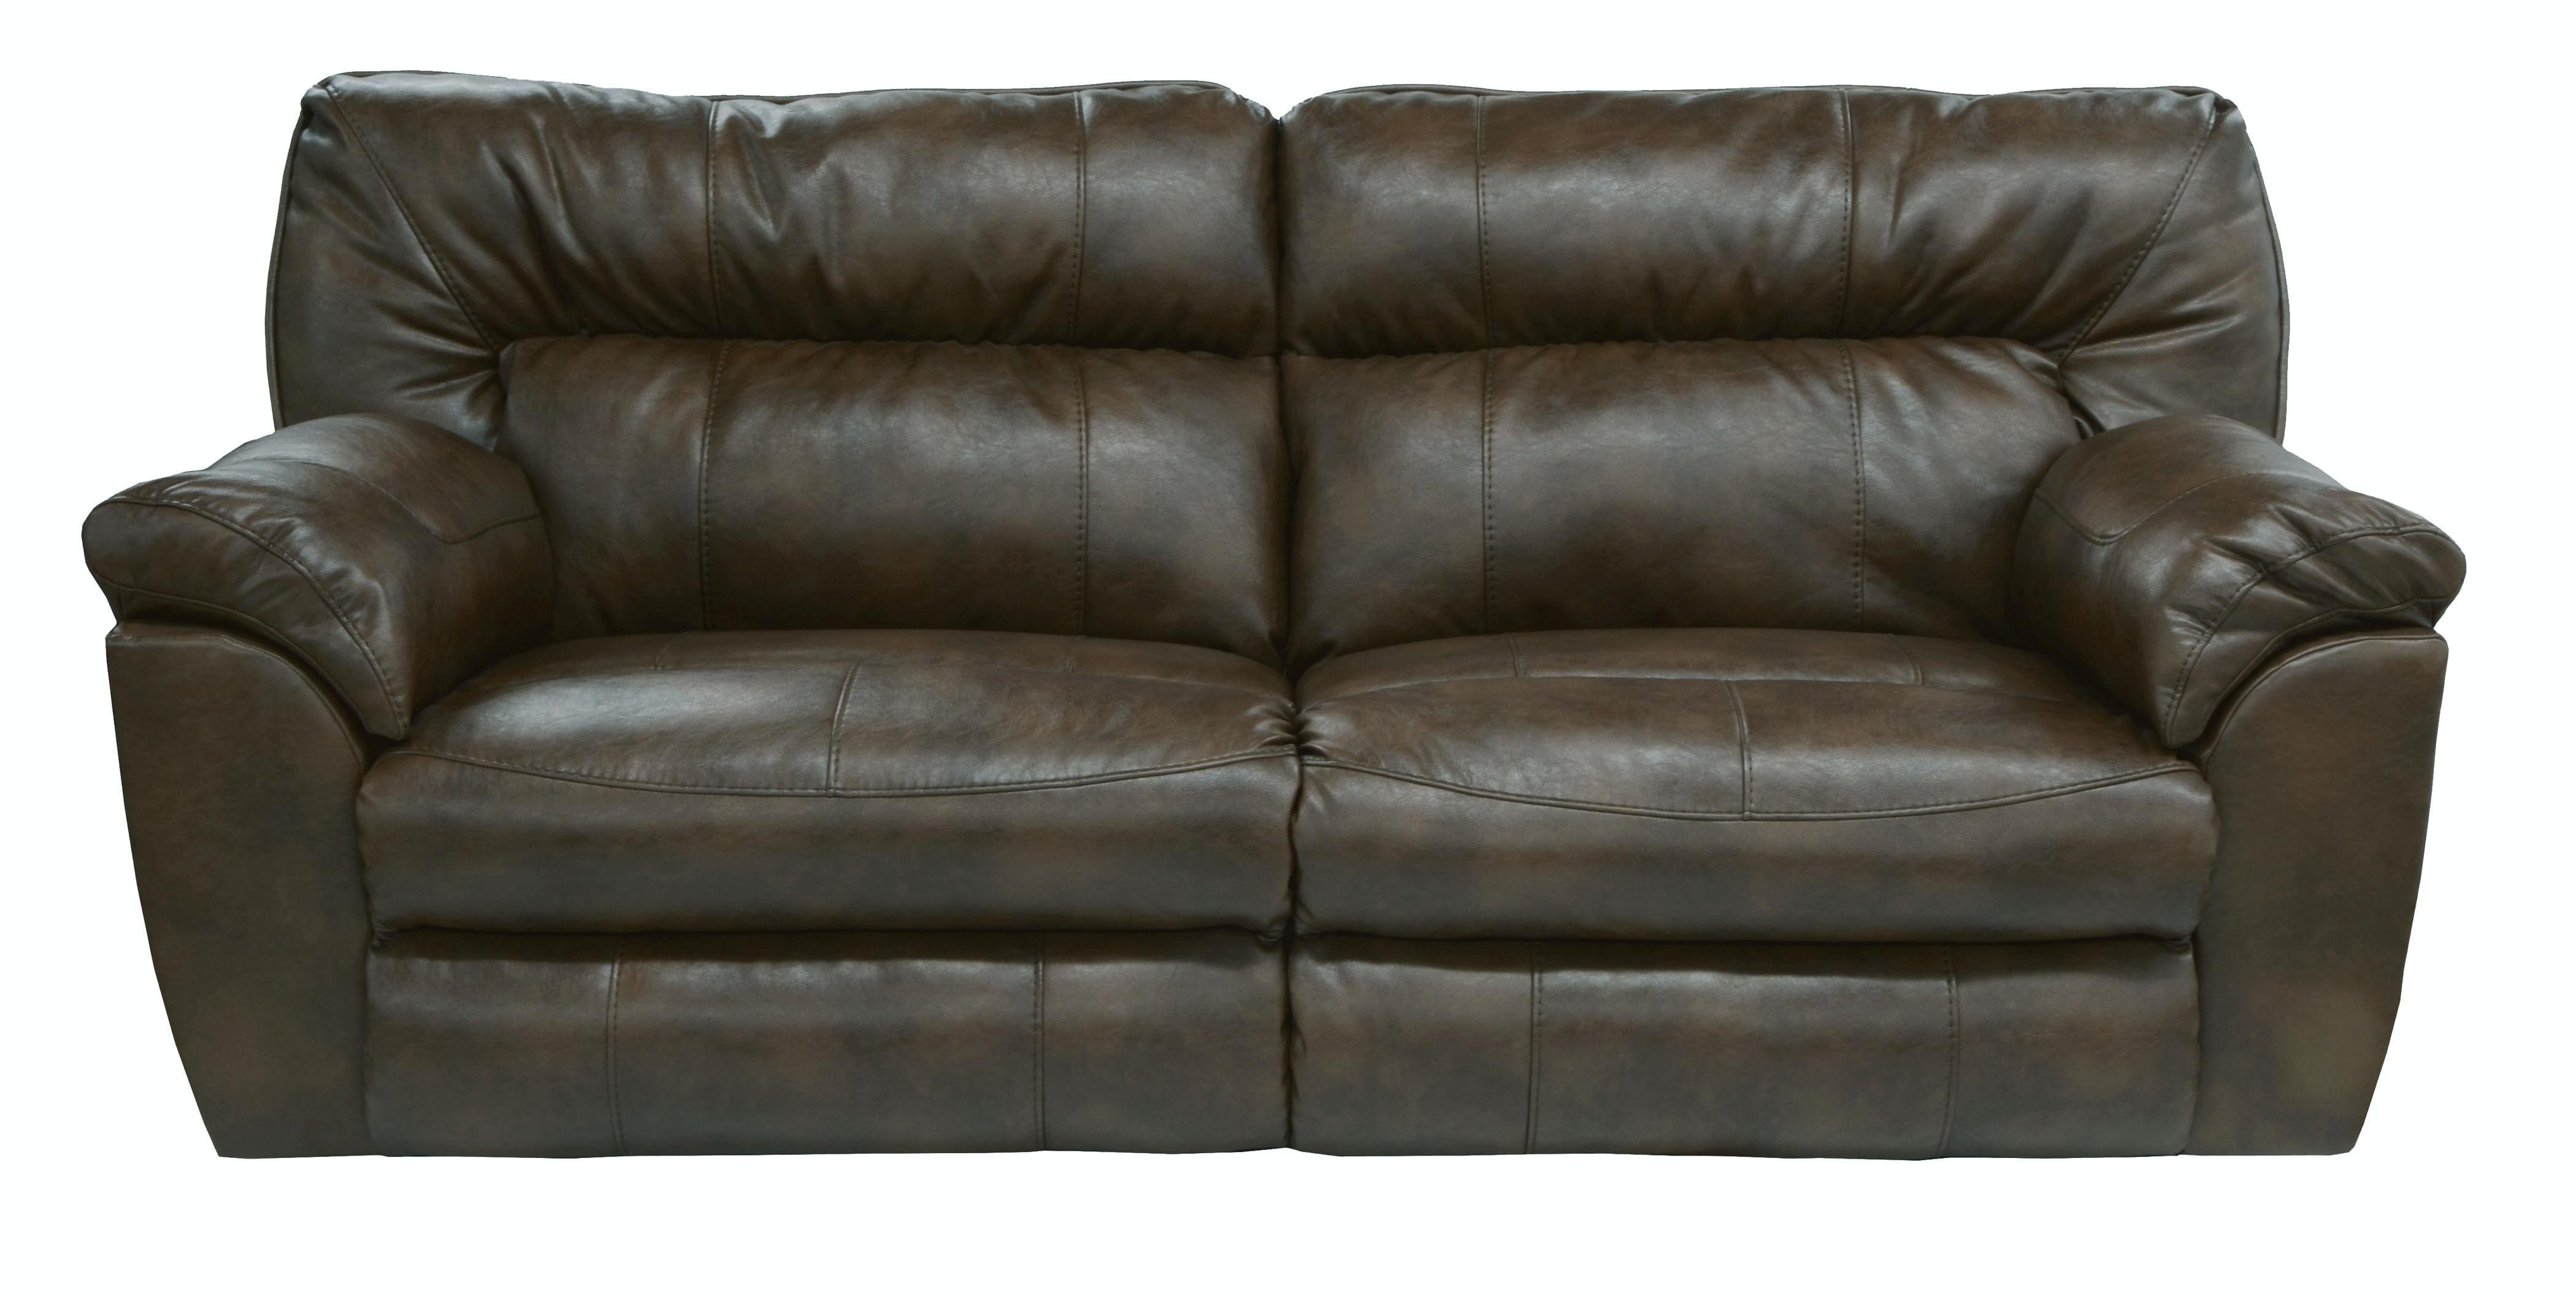 Catnapper Furniture Extra Wide Reclining Sofa 4041